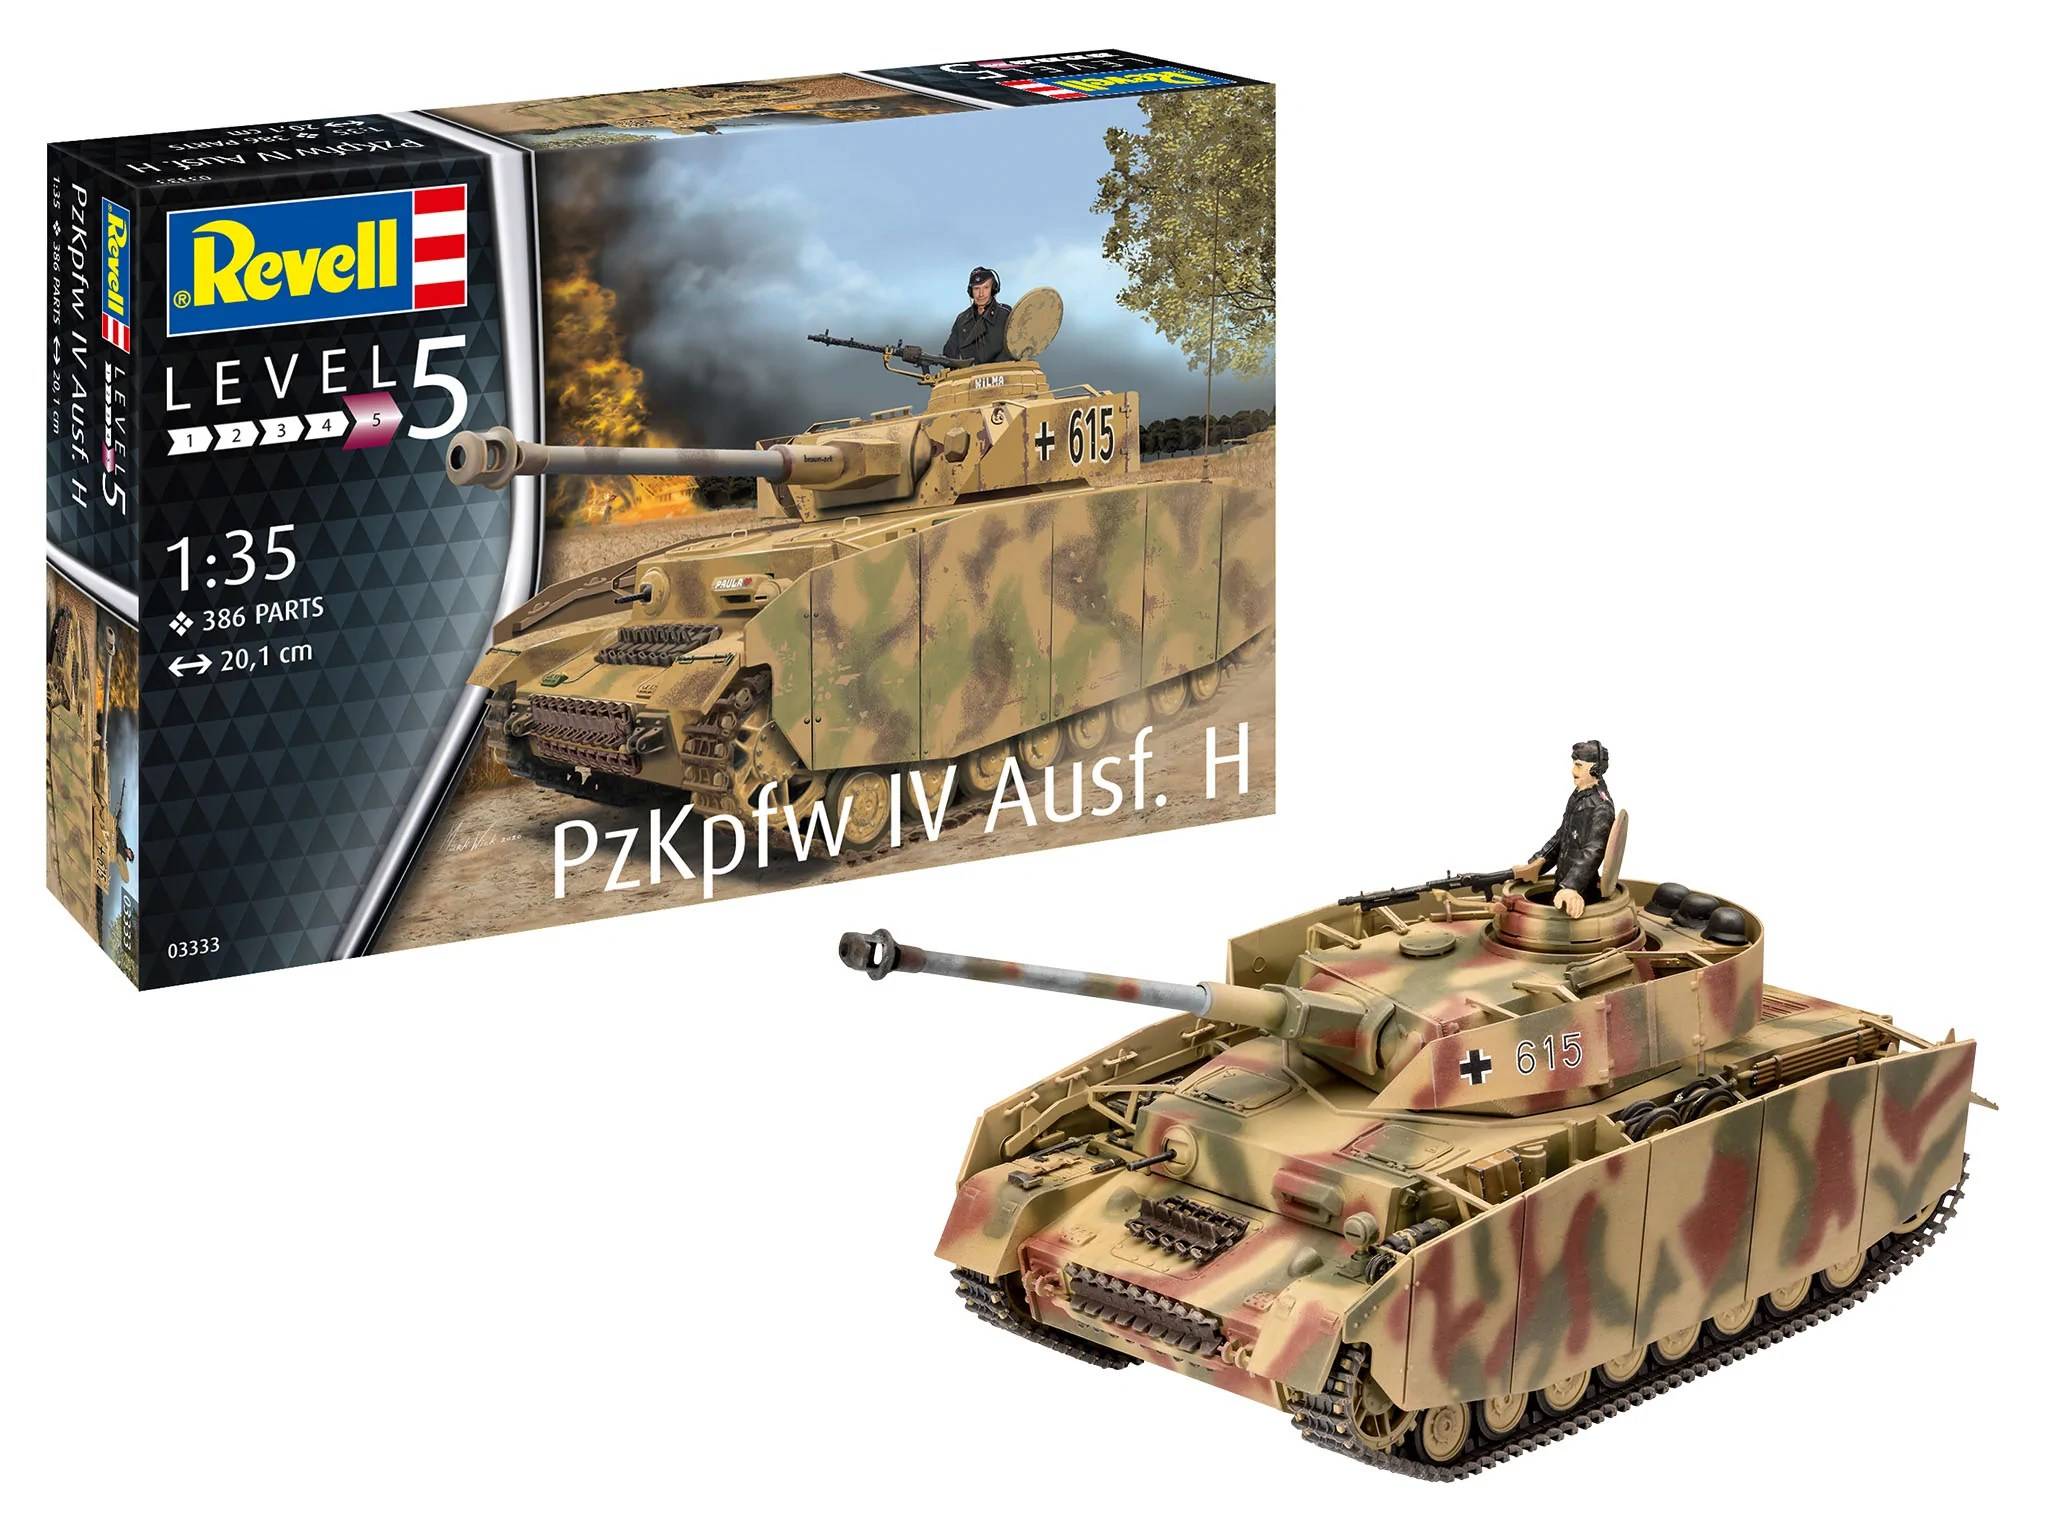 Revell Germany Military 1/35 Panzer IV Ausf H Tank Kit | Internet Hobbies